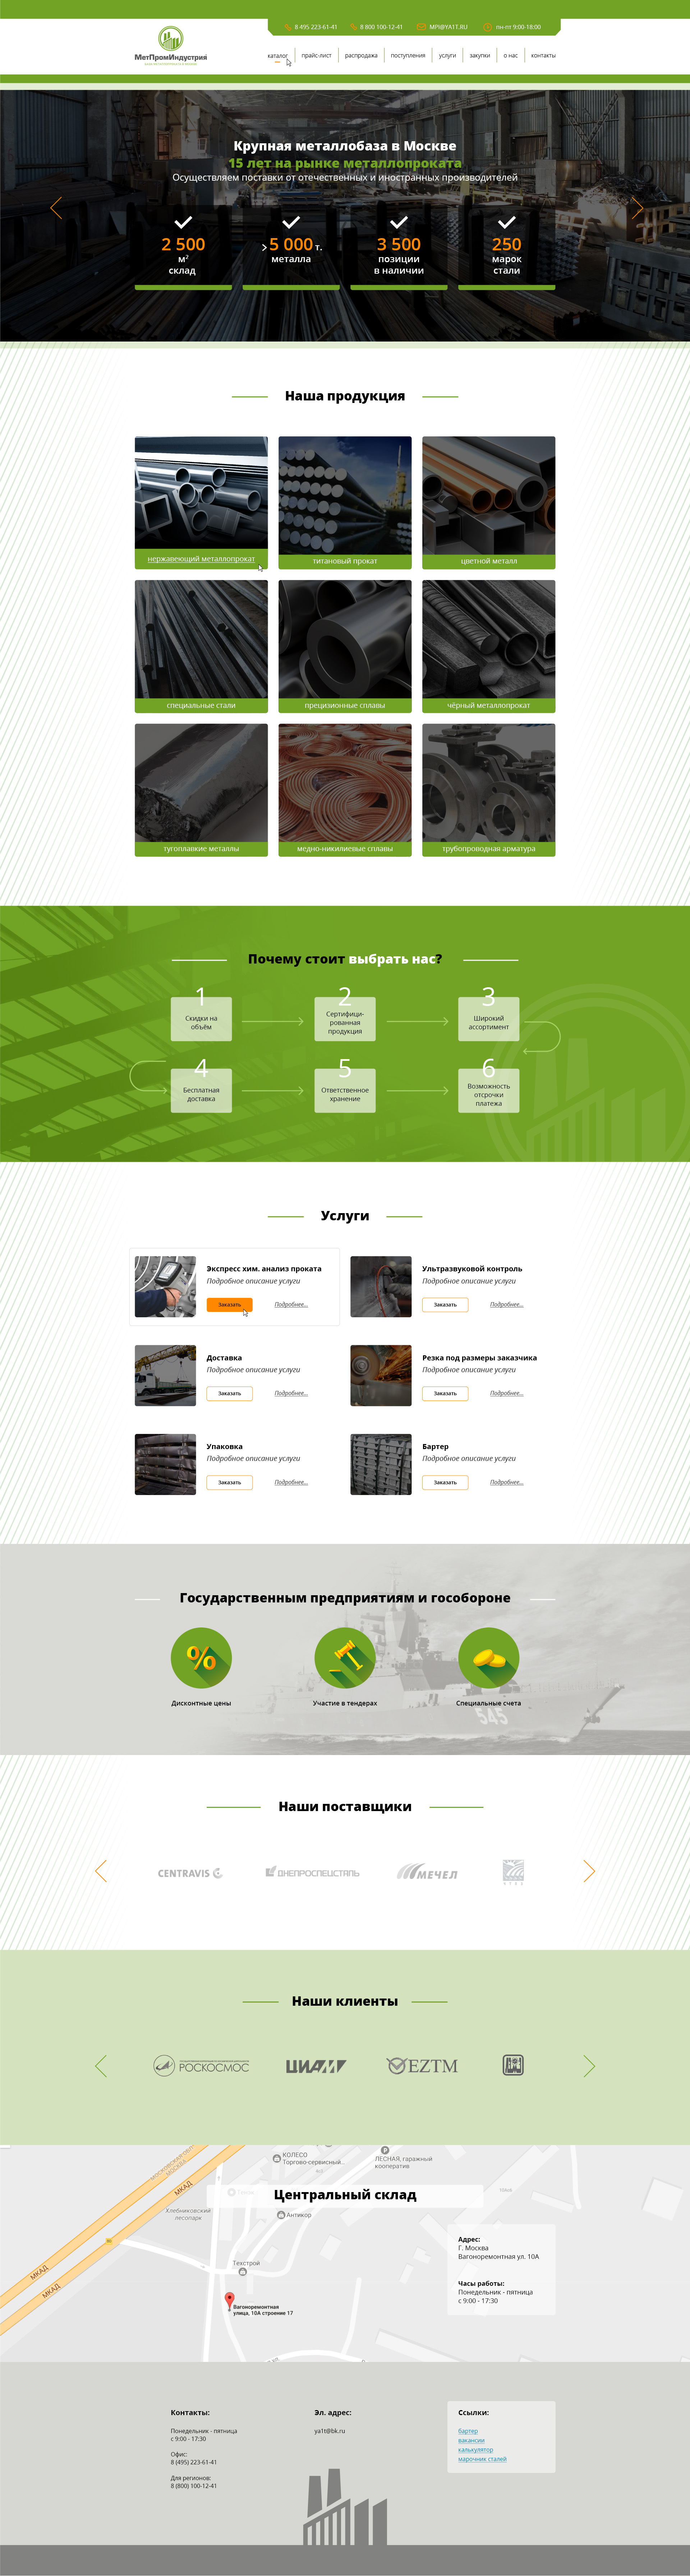 Дизайн сайта для металлоторгующей компании фото f_1245992fab4b0267.jpg